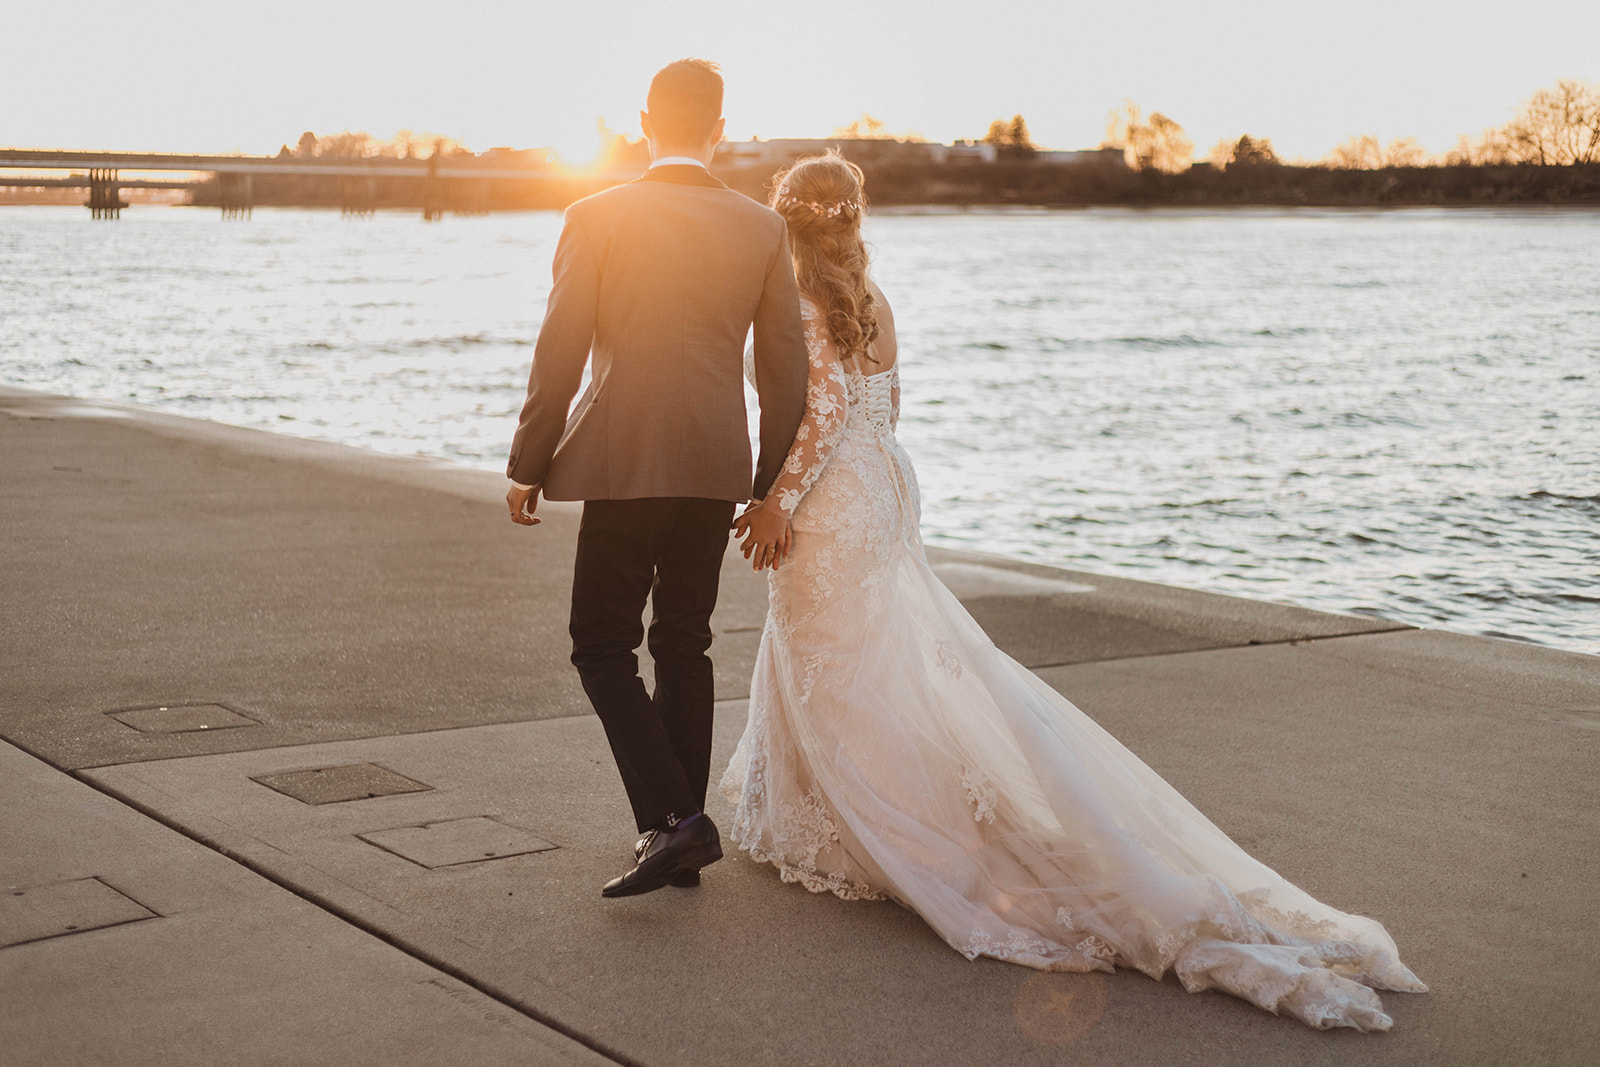 UBC Boathouse Wedding Couple Ruby and Roy walk along the Vancouver water edge